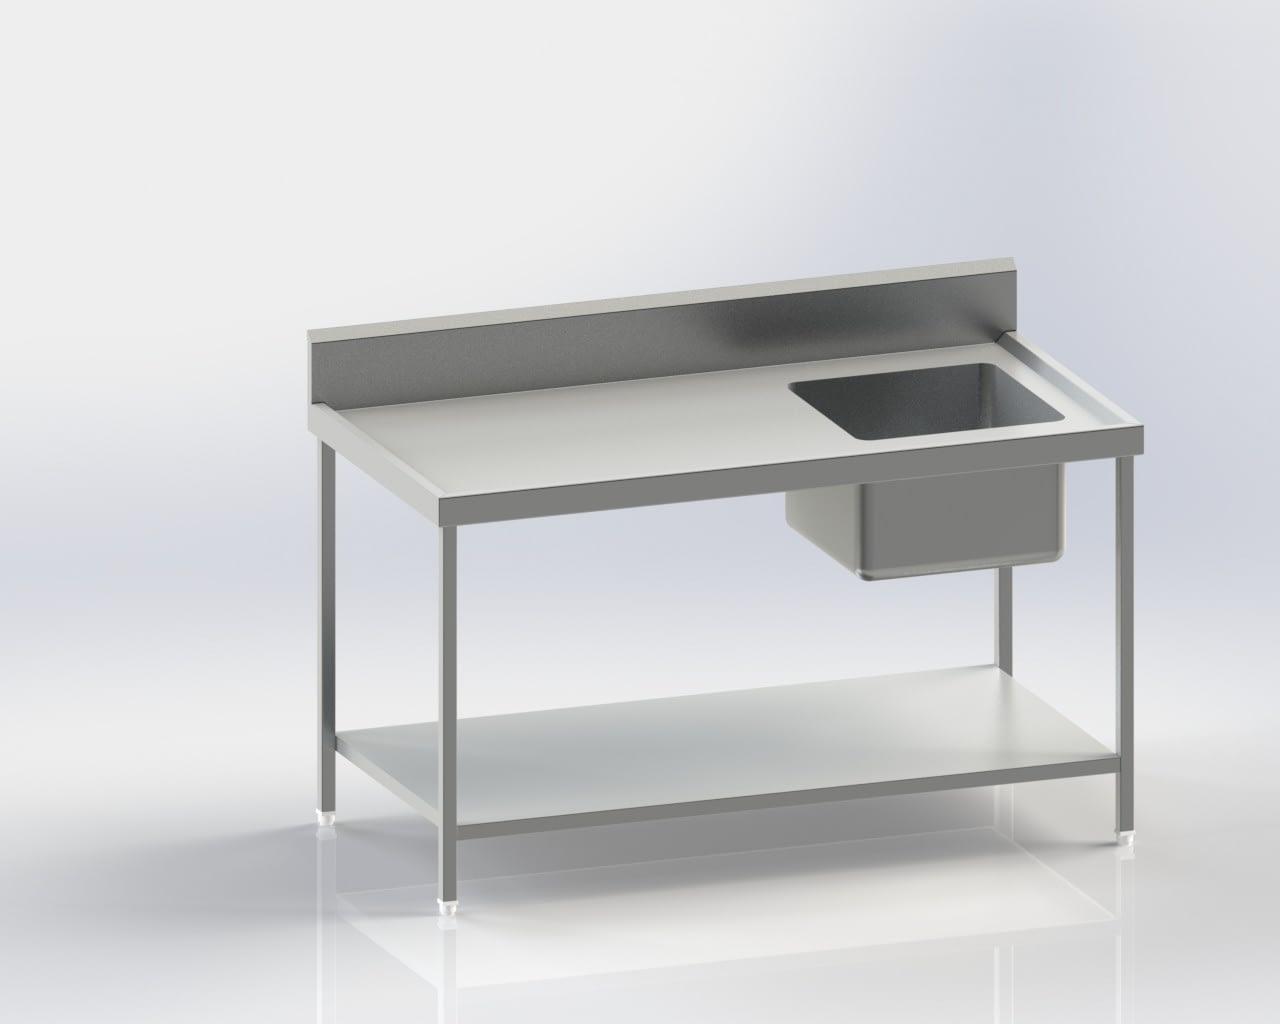 Work Table/Backsplash/Sink(right)